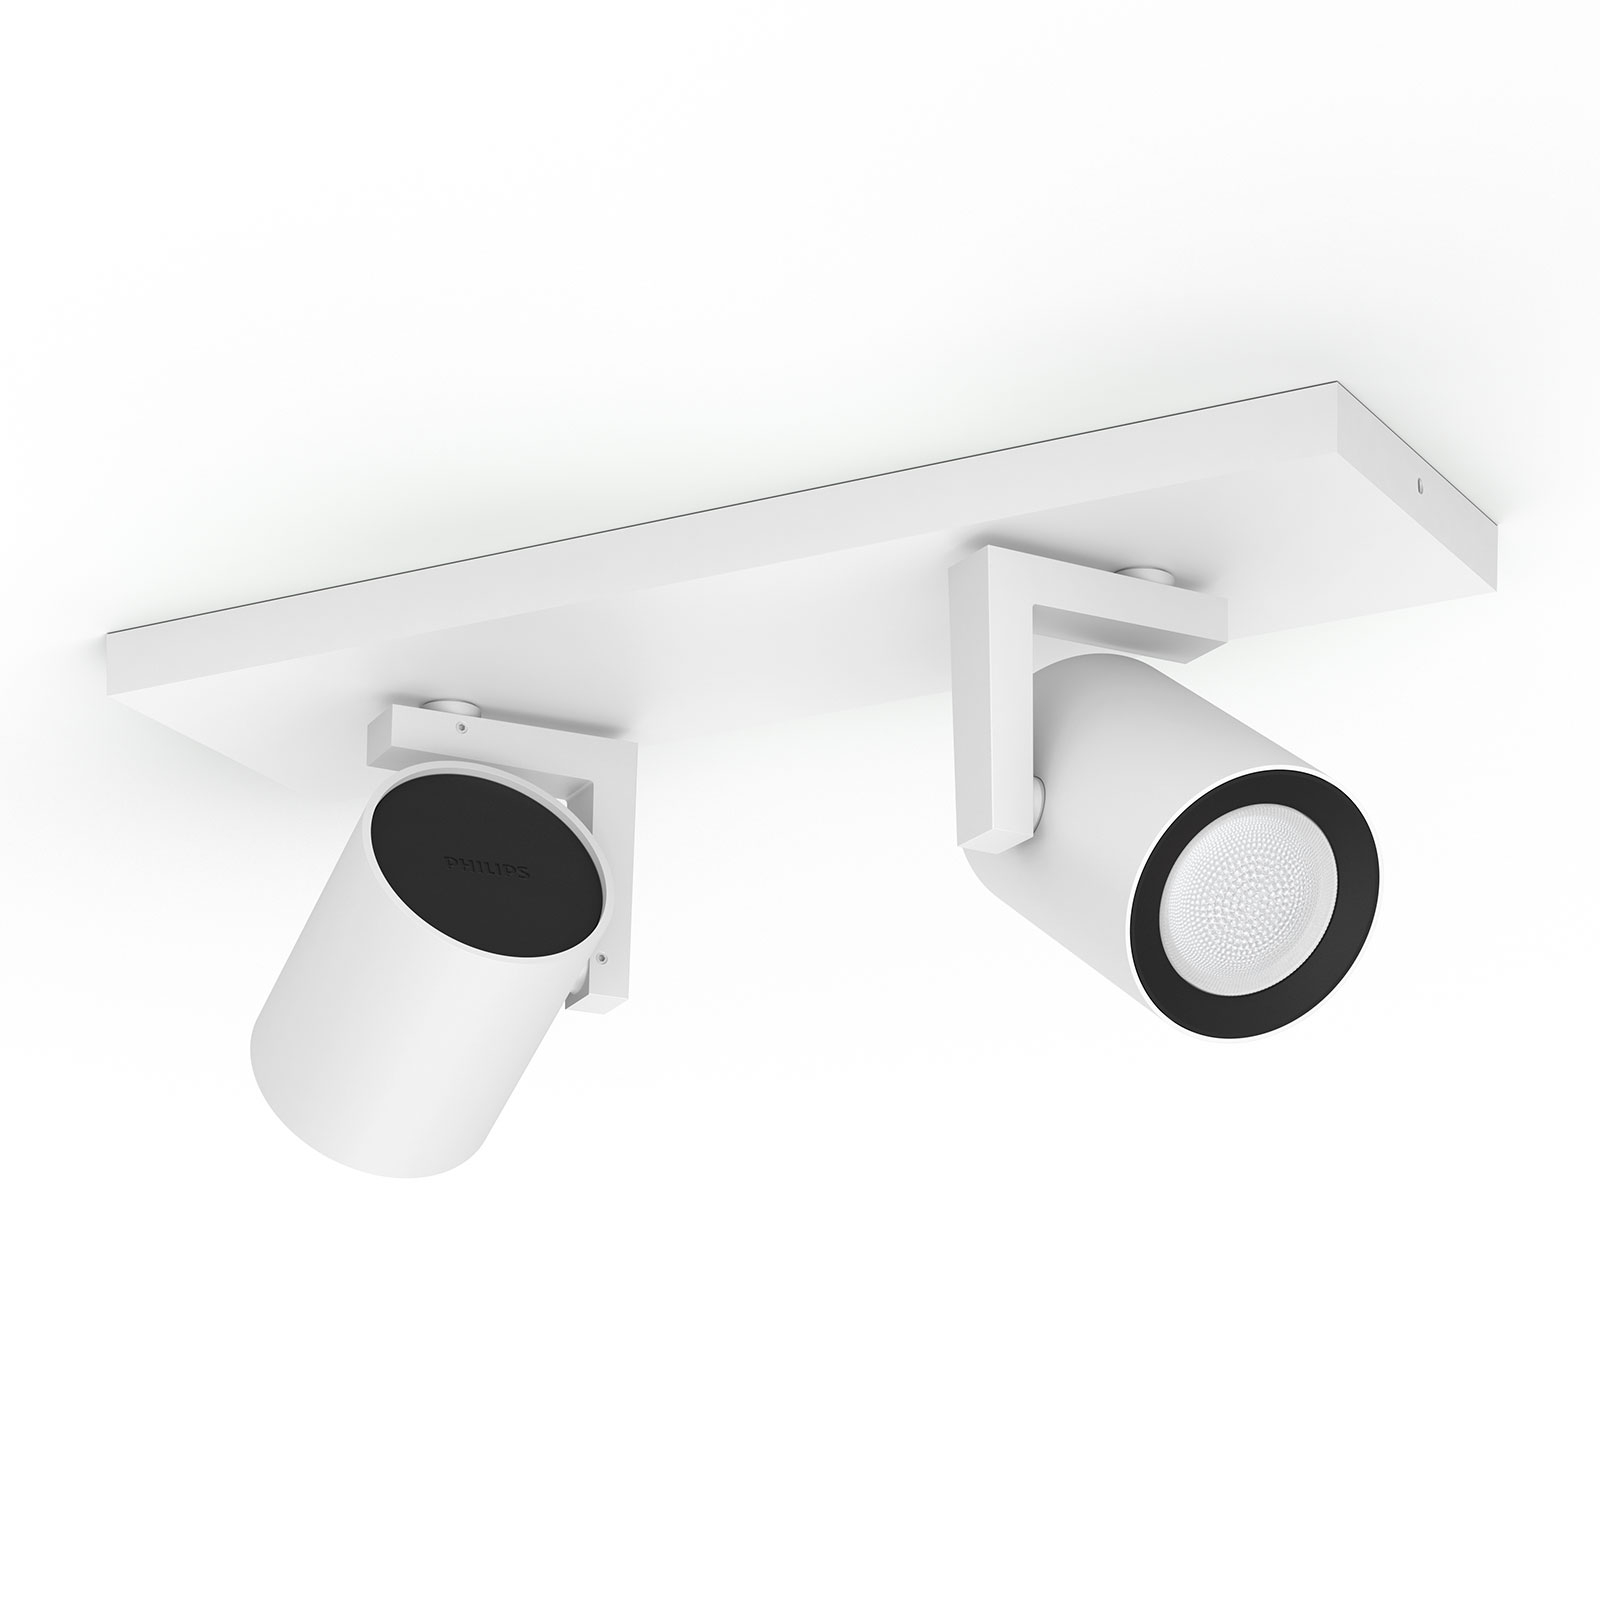 Philips Hue Argenta LED-Spot zweiflammig weiß